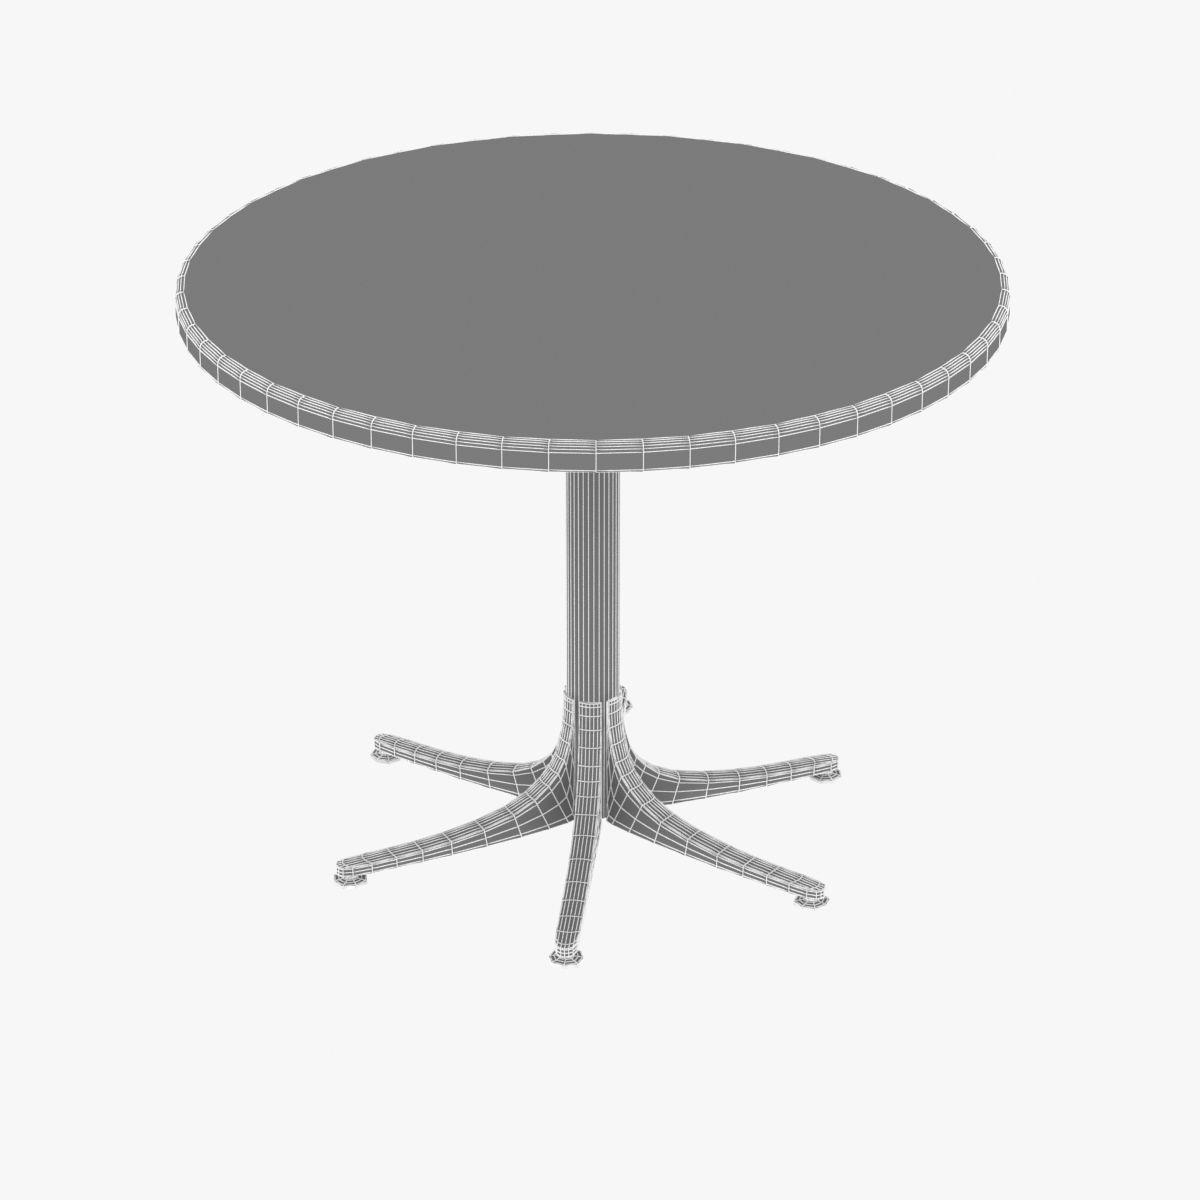 ... Dwr Inox Table Large Round 3d Model Max Obj 3ds Fbx Mtl 7 ...